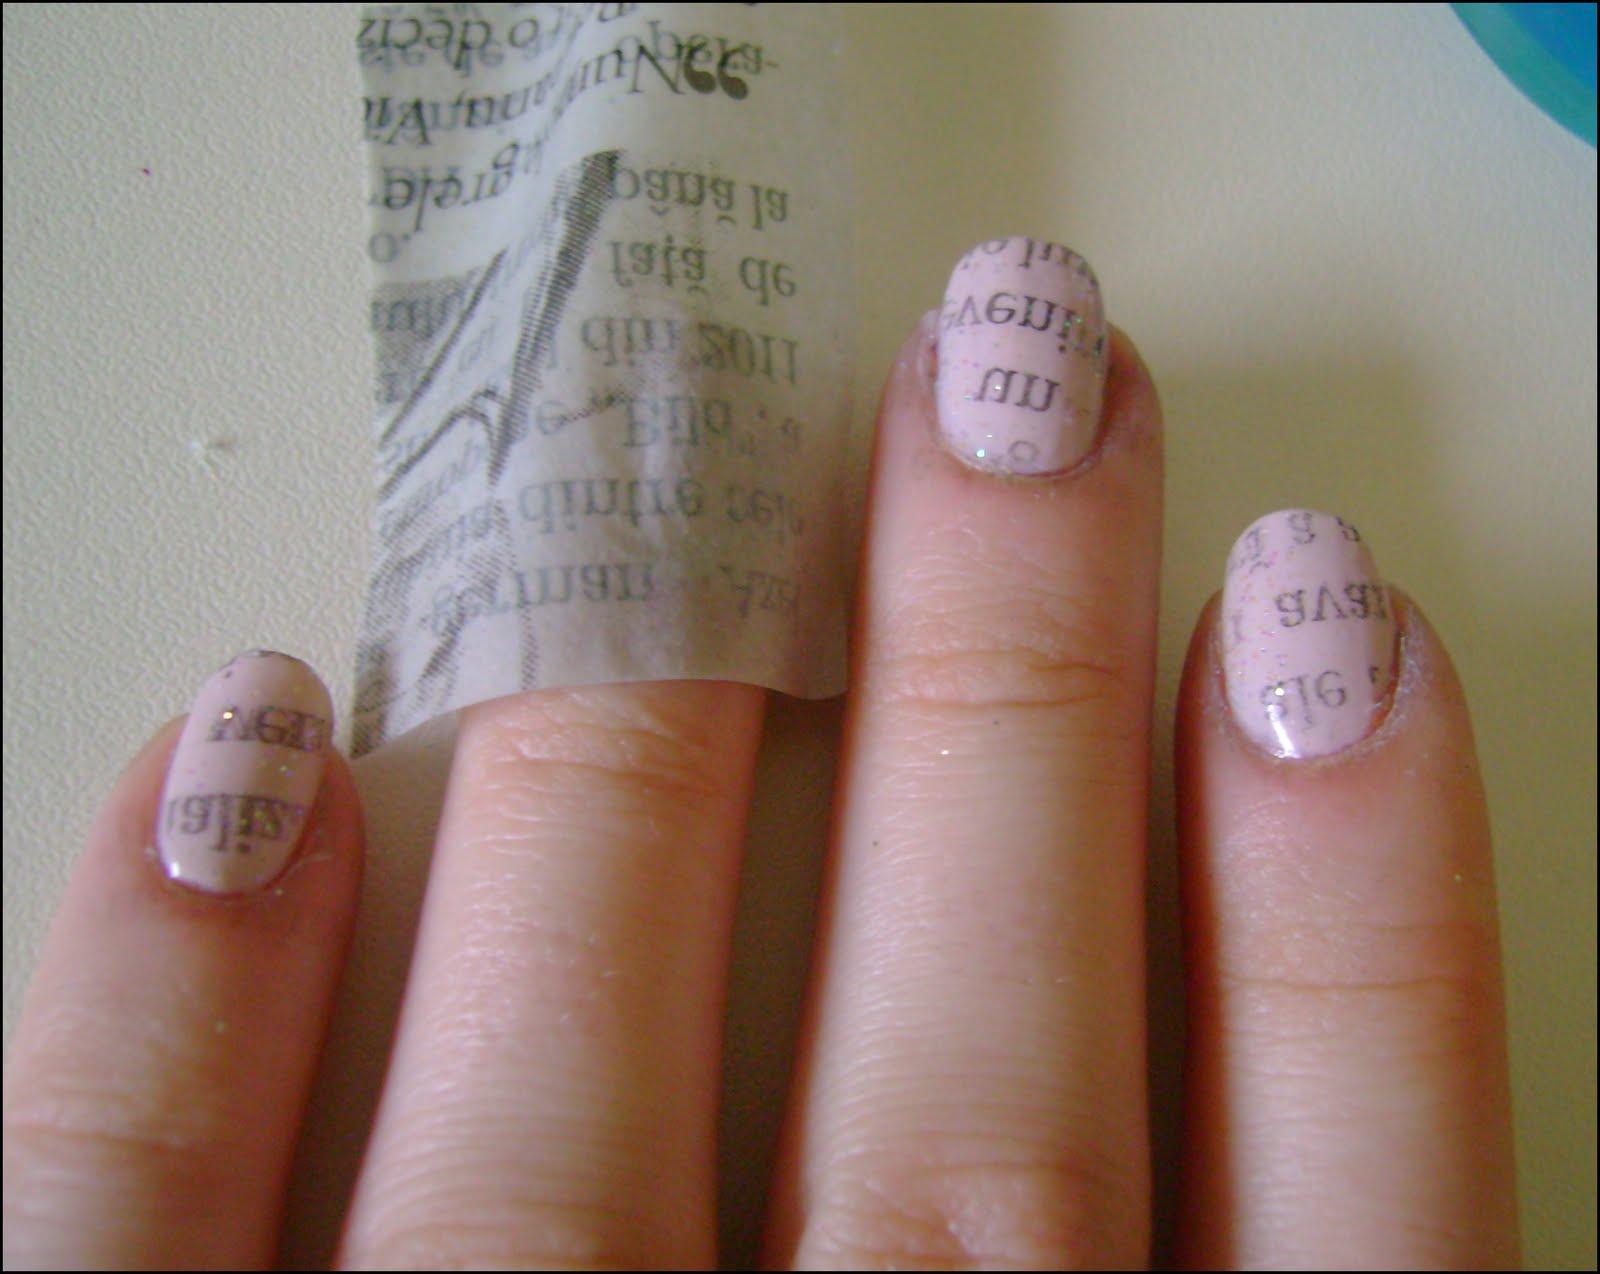 acrylic nail art designs: Newspaper nails - TUTORIAL